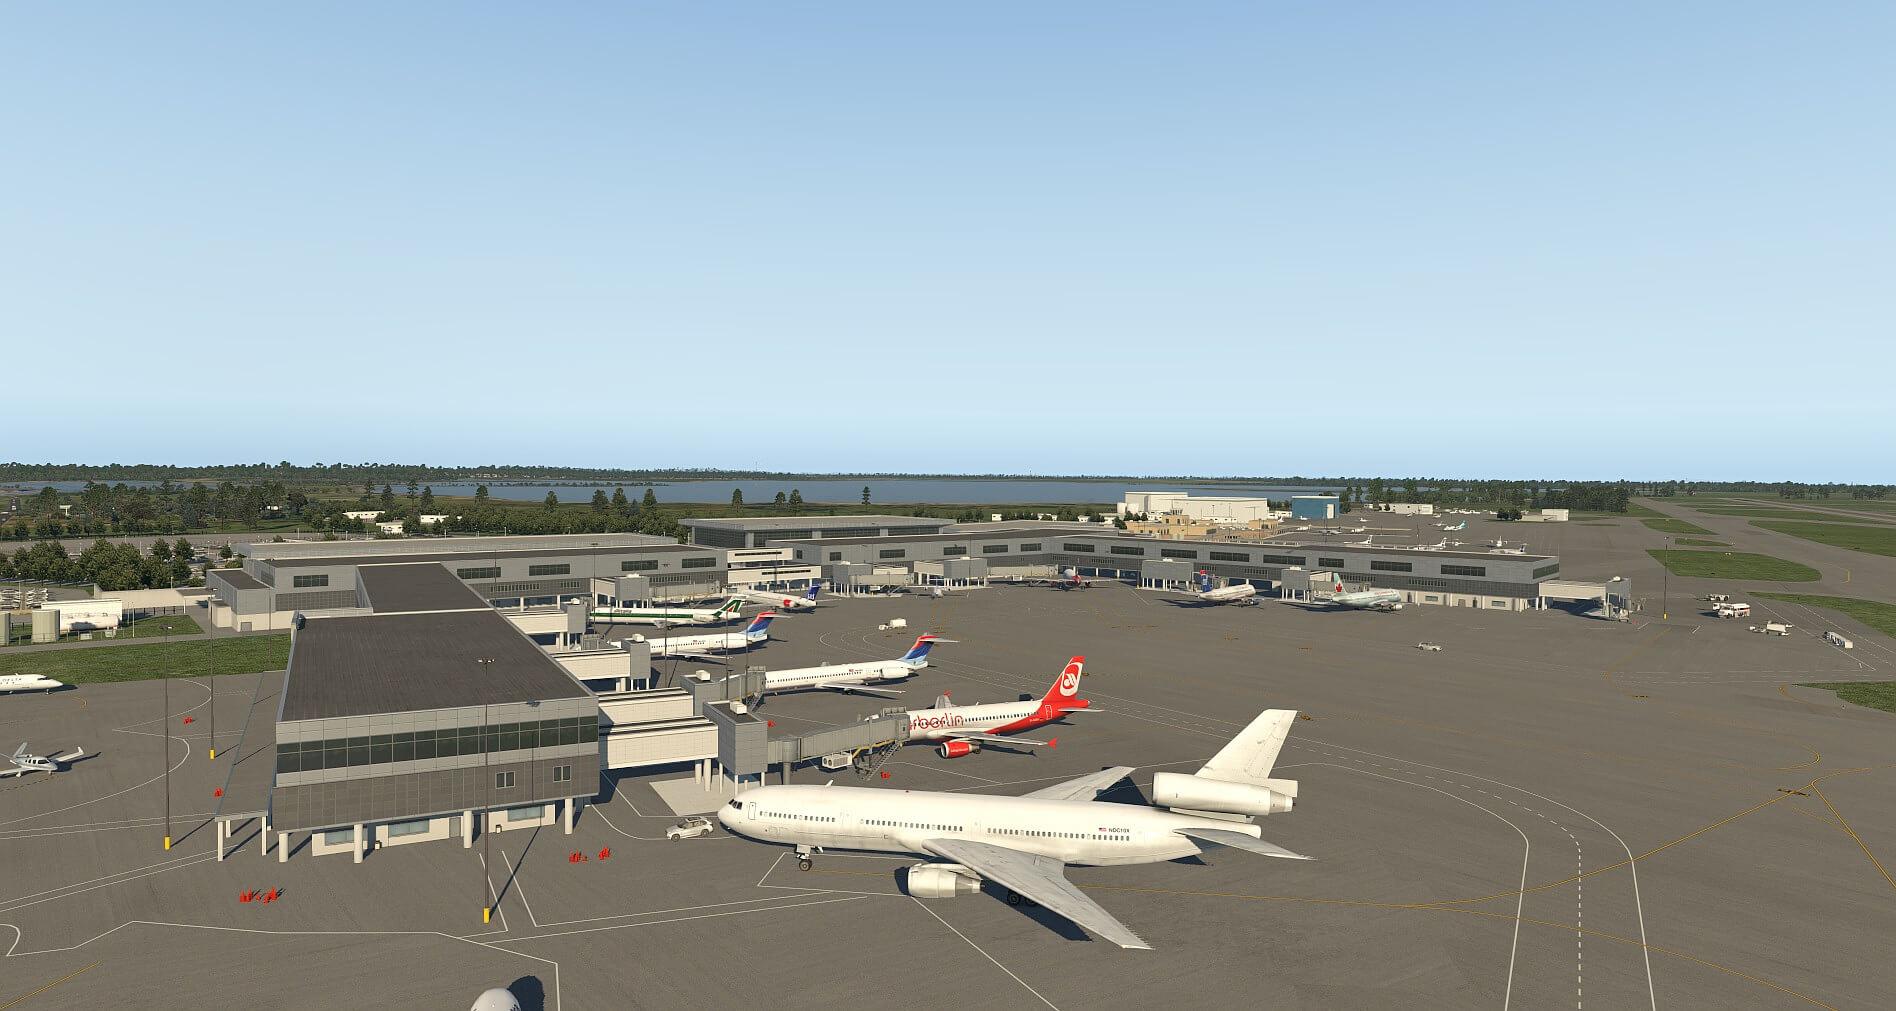 x plane 11 flight